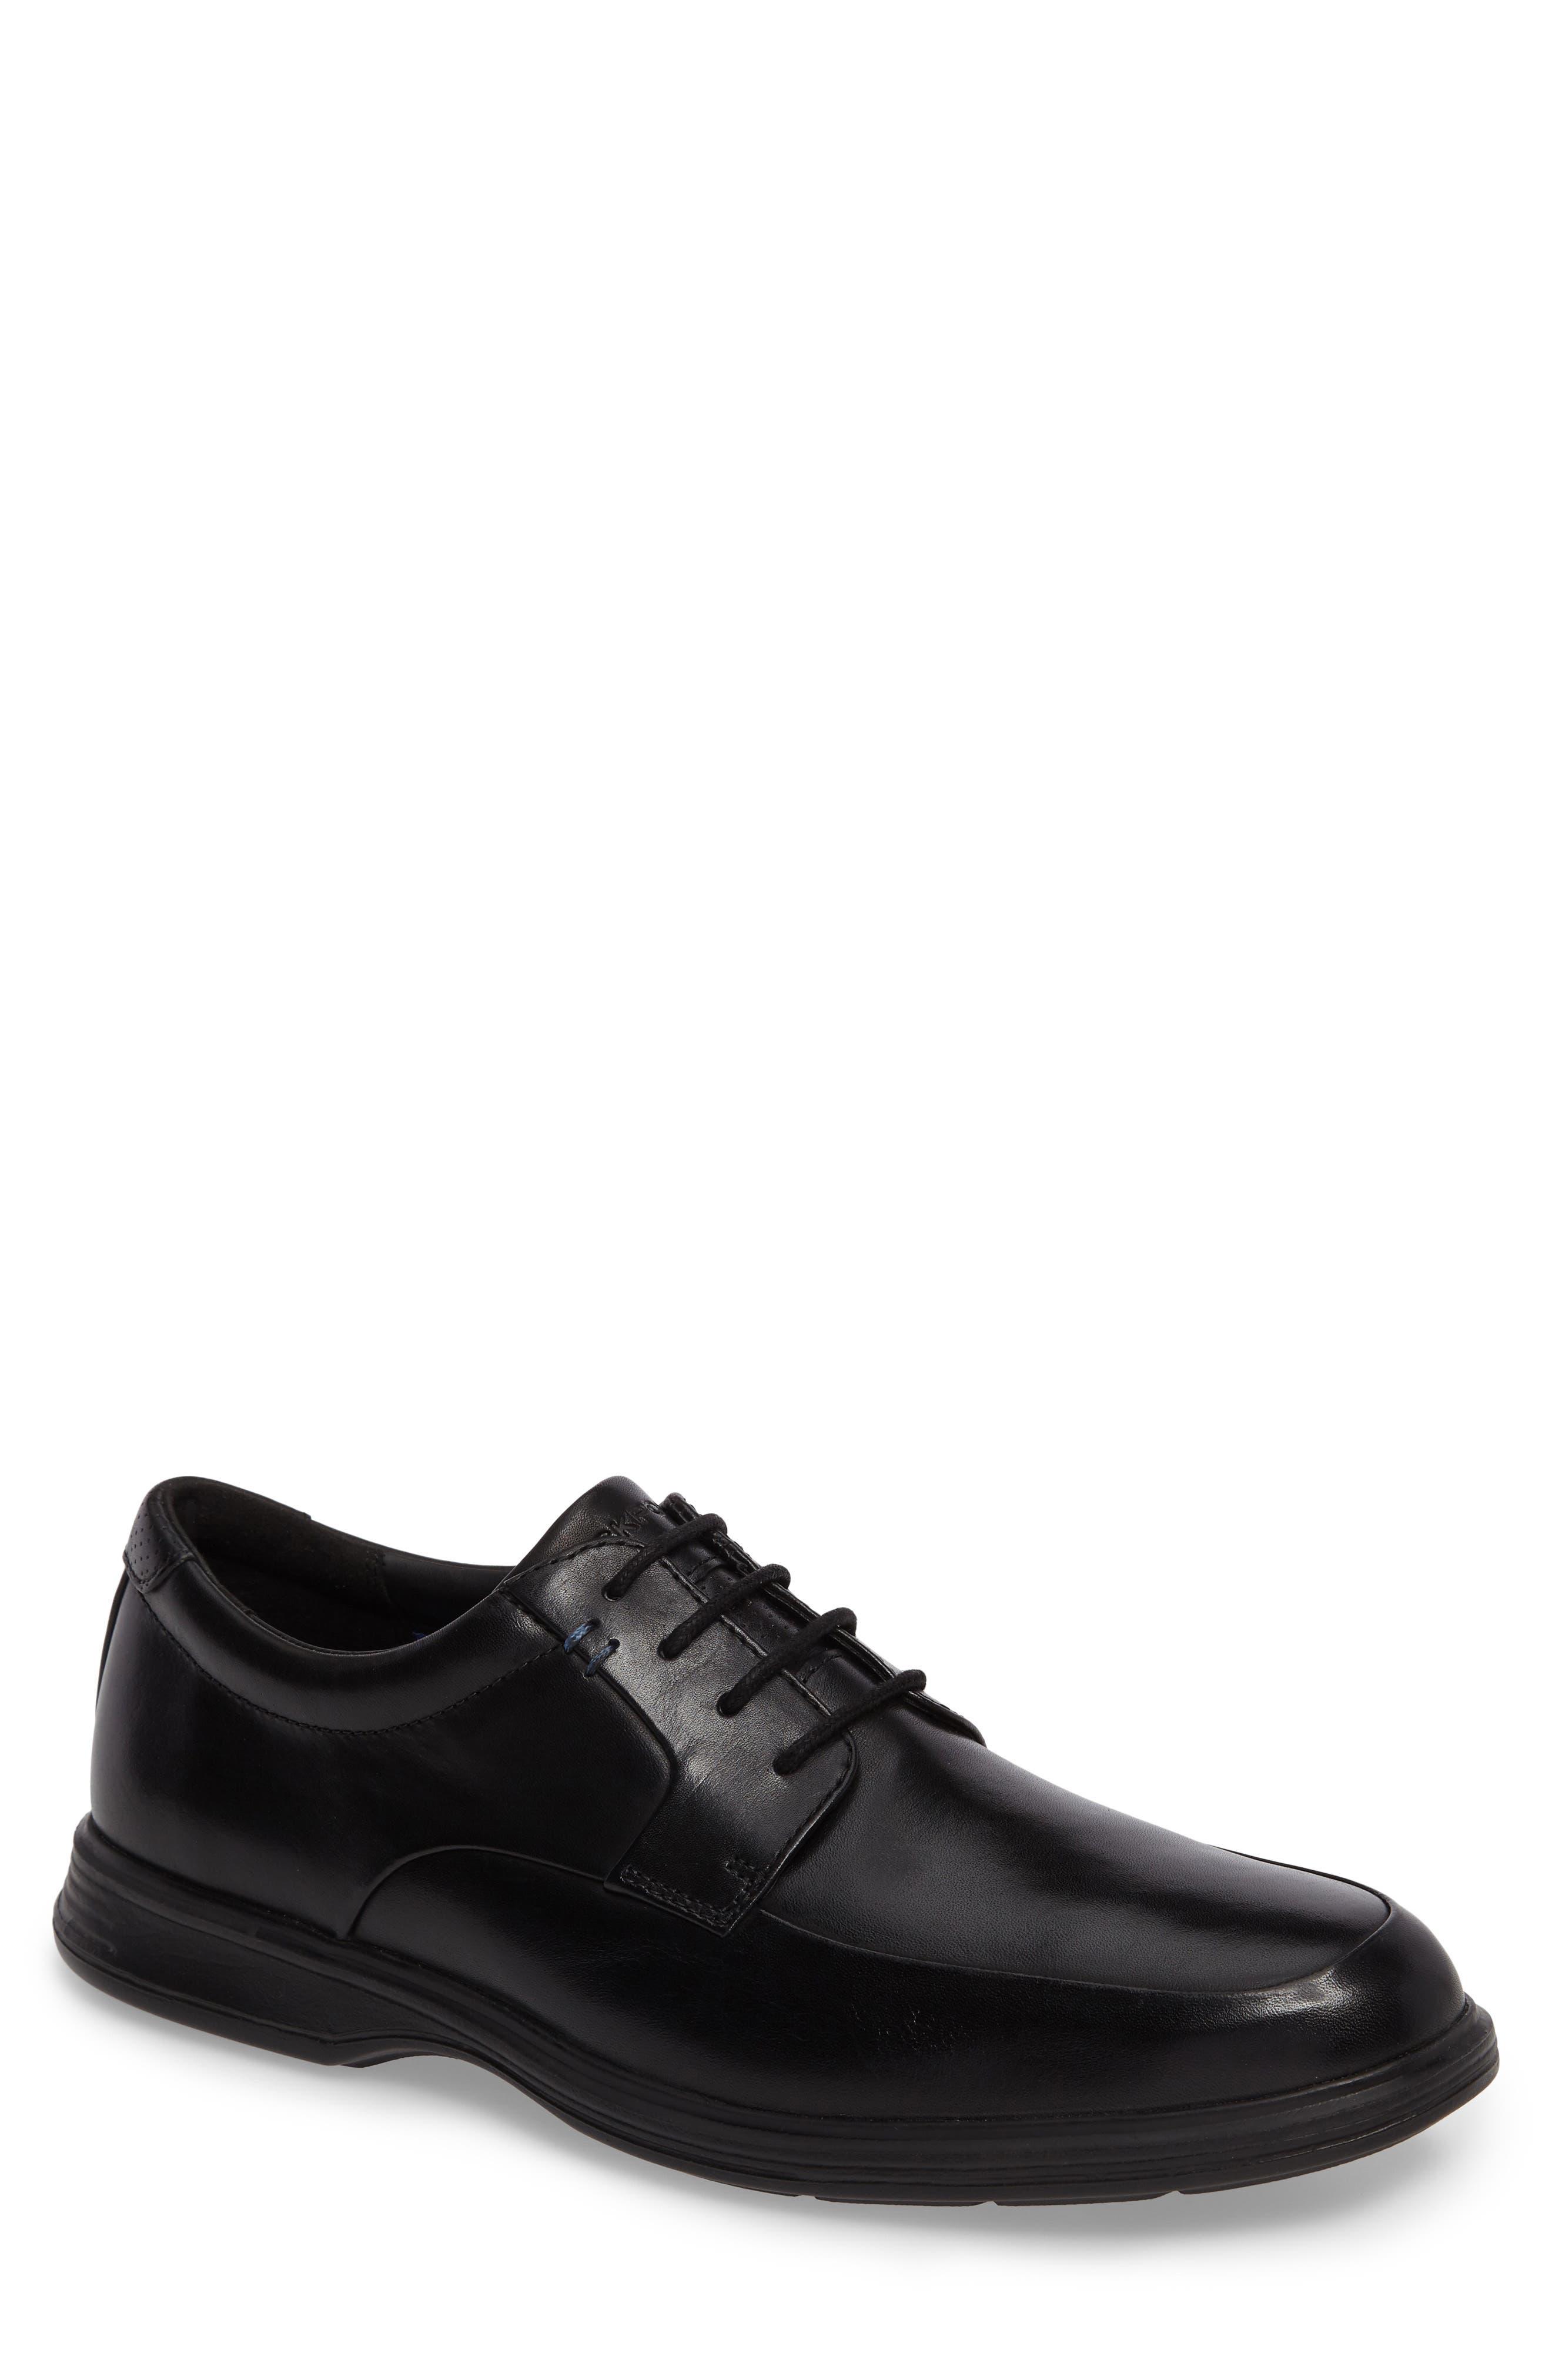 DresSports 2 Lite Apron Toe Derby,                             Main thumbnail 1, color,                             Black Leather